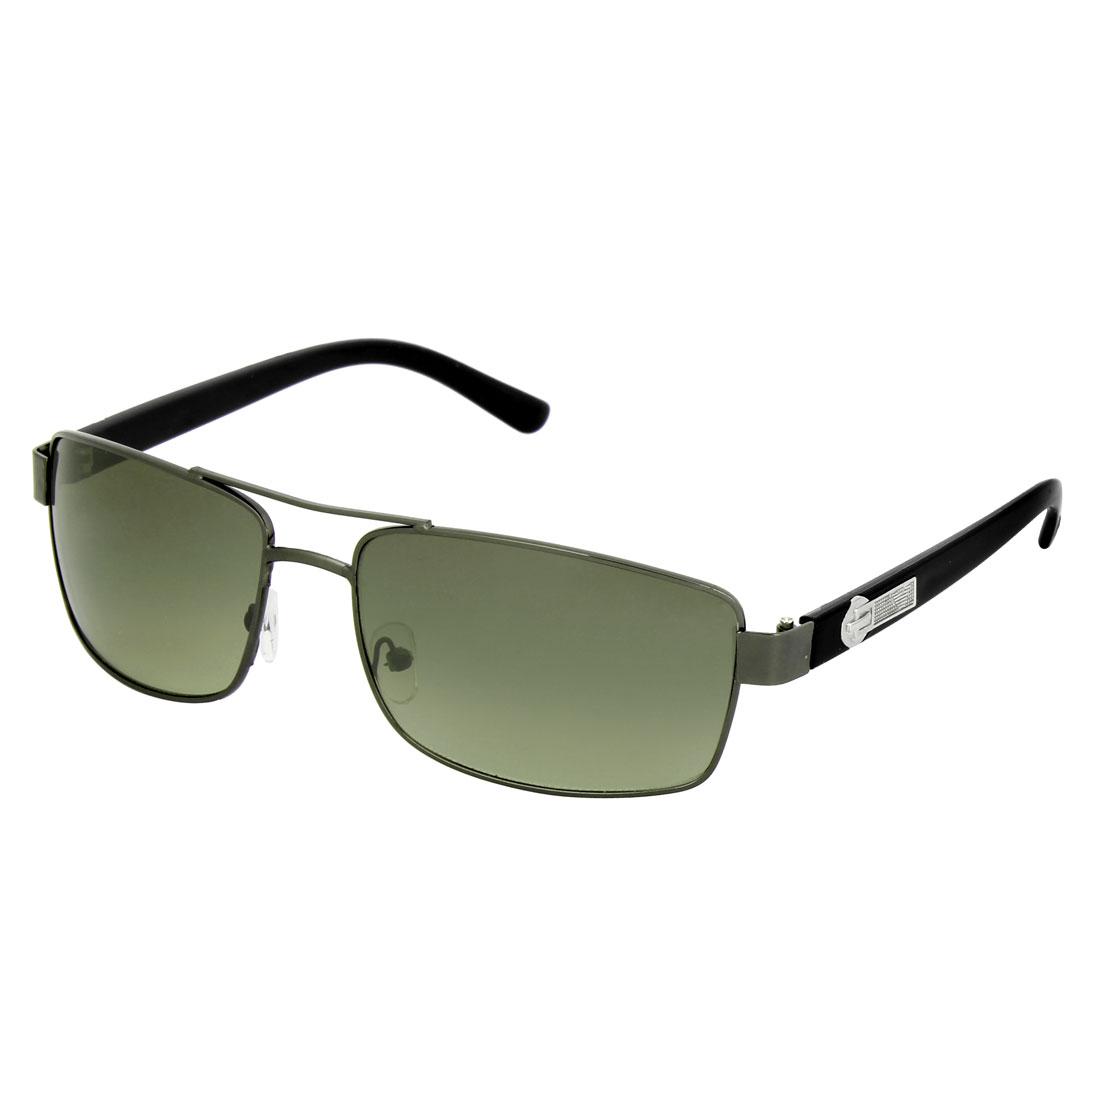 Dual Bridge Green Lens Aviator Polarized Sunglasses for Men